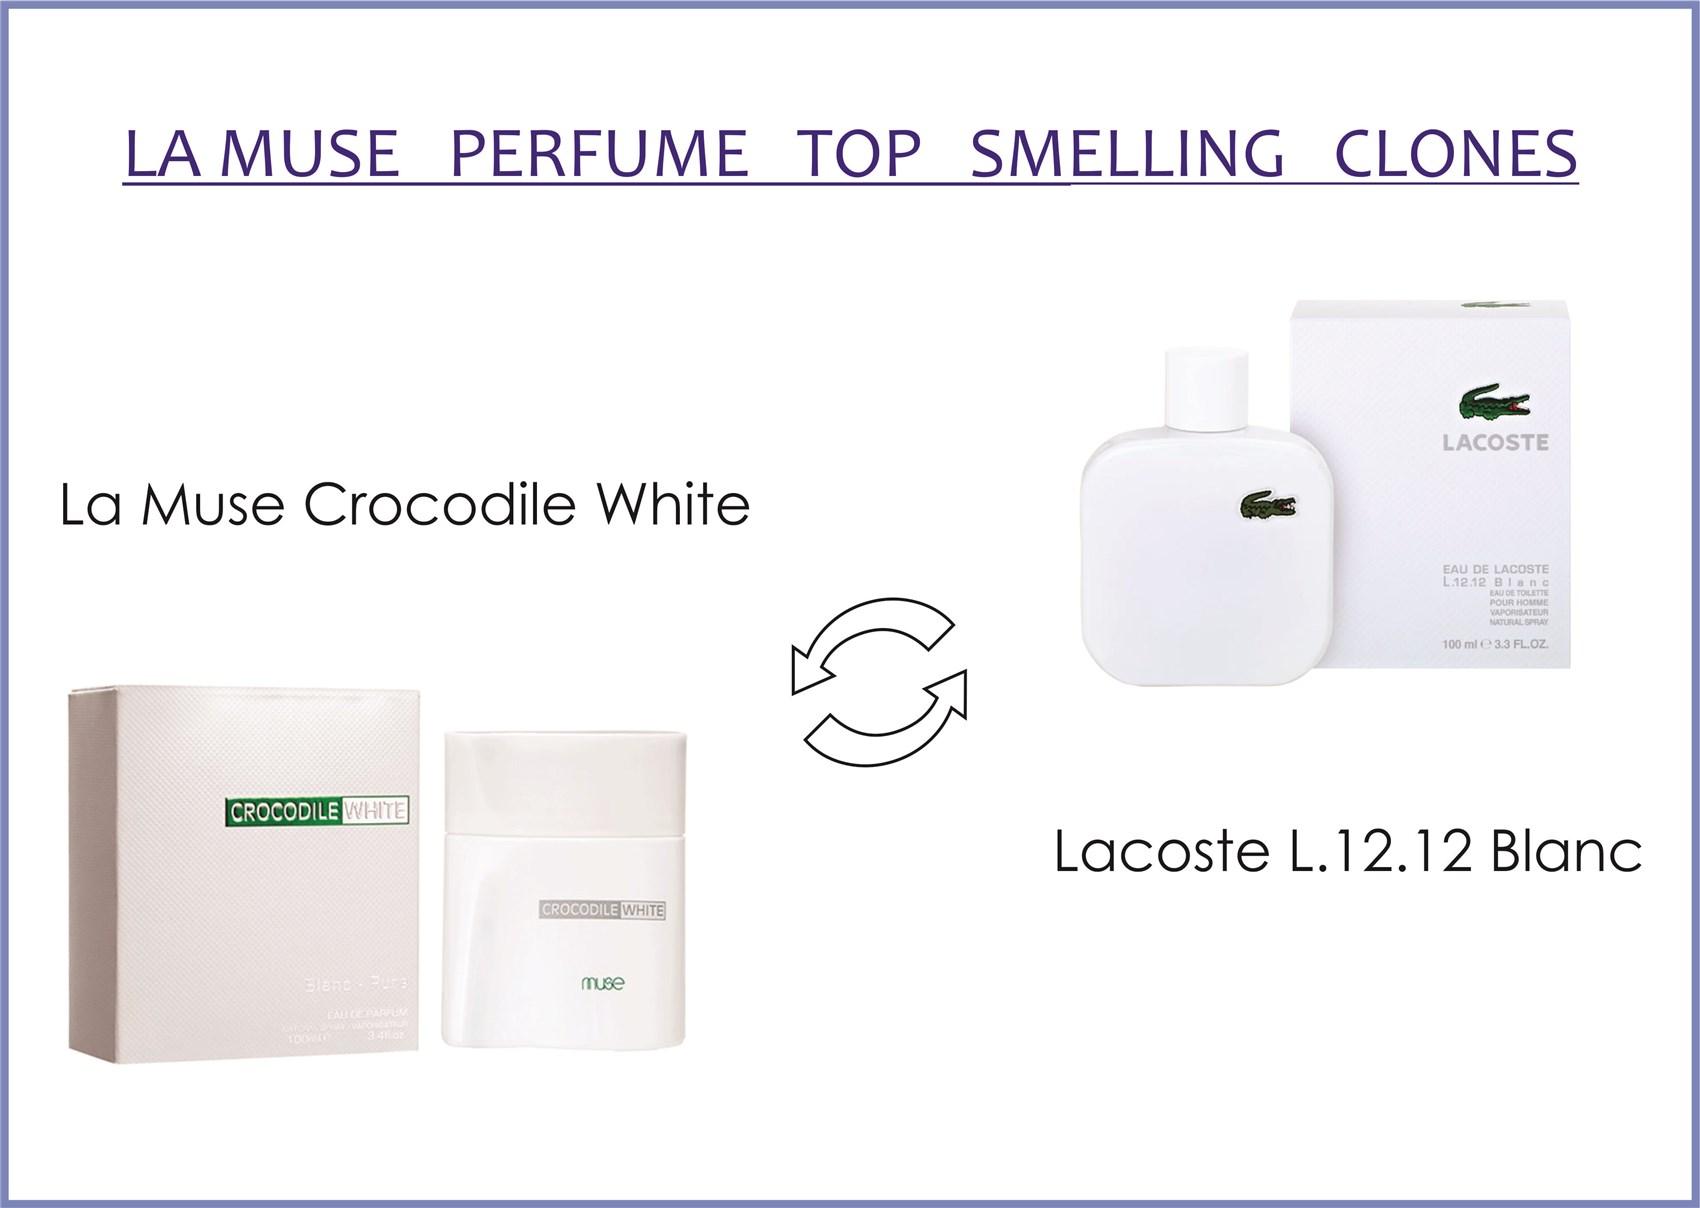 la-muse-crocodile-white-for-men-100-ml-edp-by-lattafa-perfumes-lacoste-l-12-12-blanc-perfume-for-men-100-ml-edt